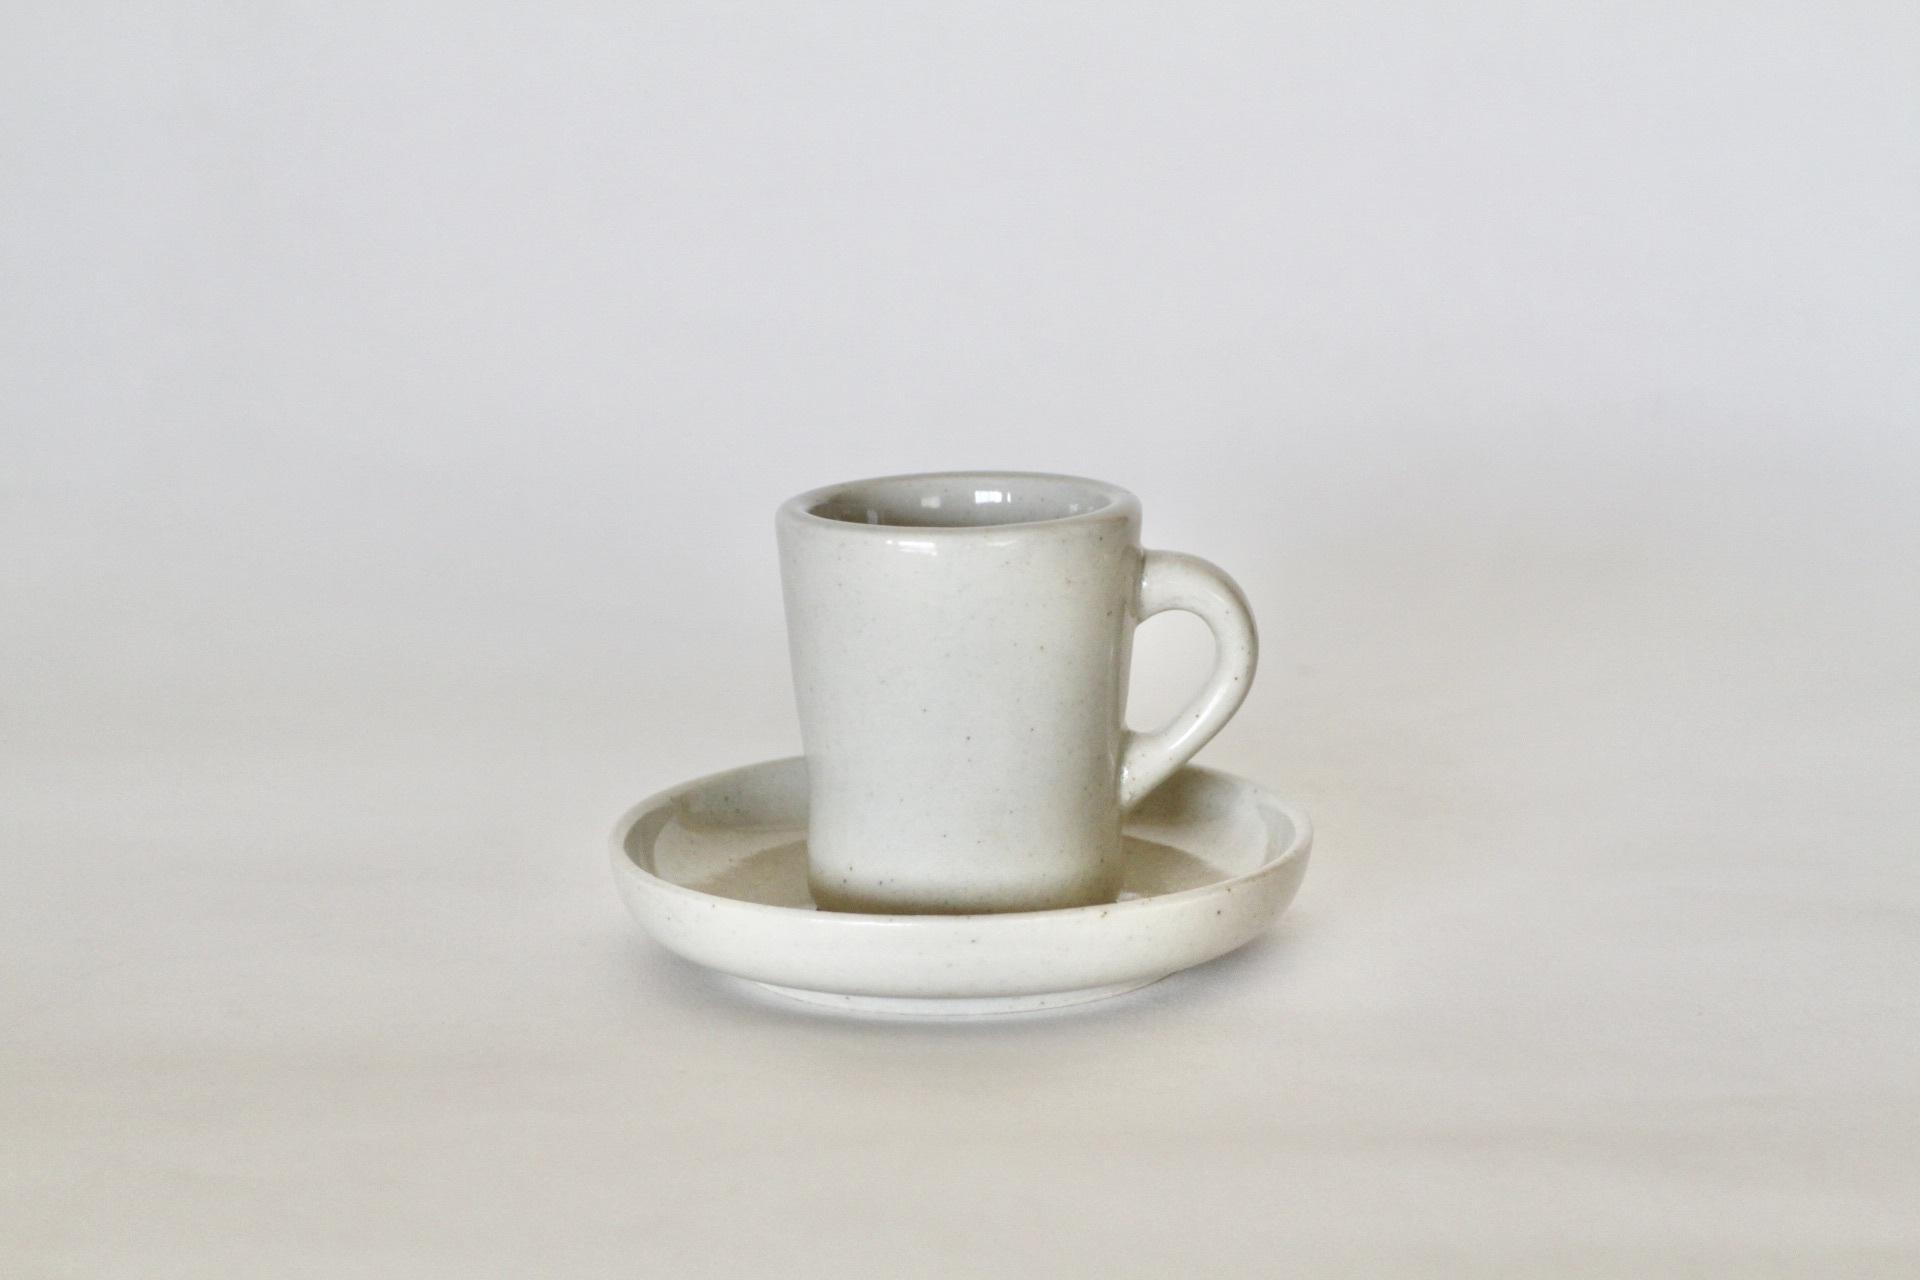 ANDC Diner ESPRESSO Cup_f0220354_16591357.jpeg